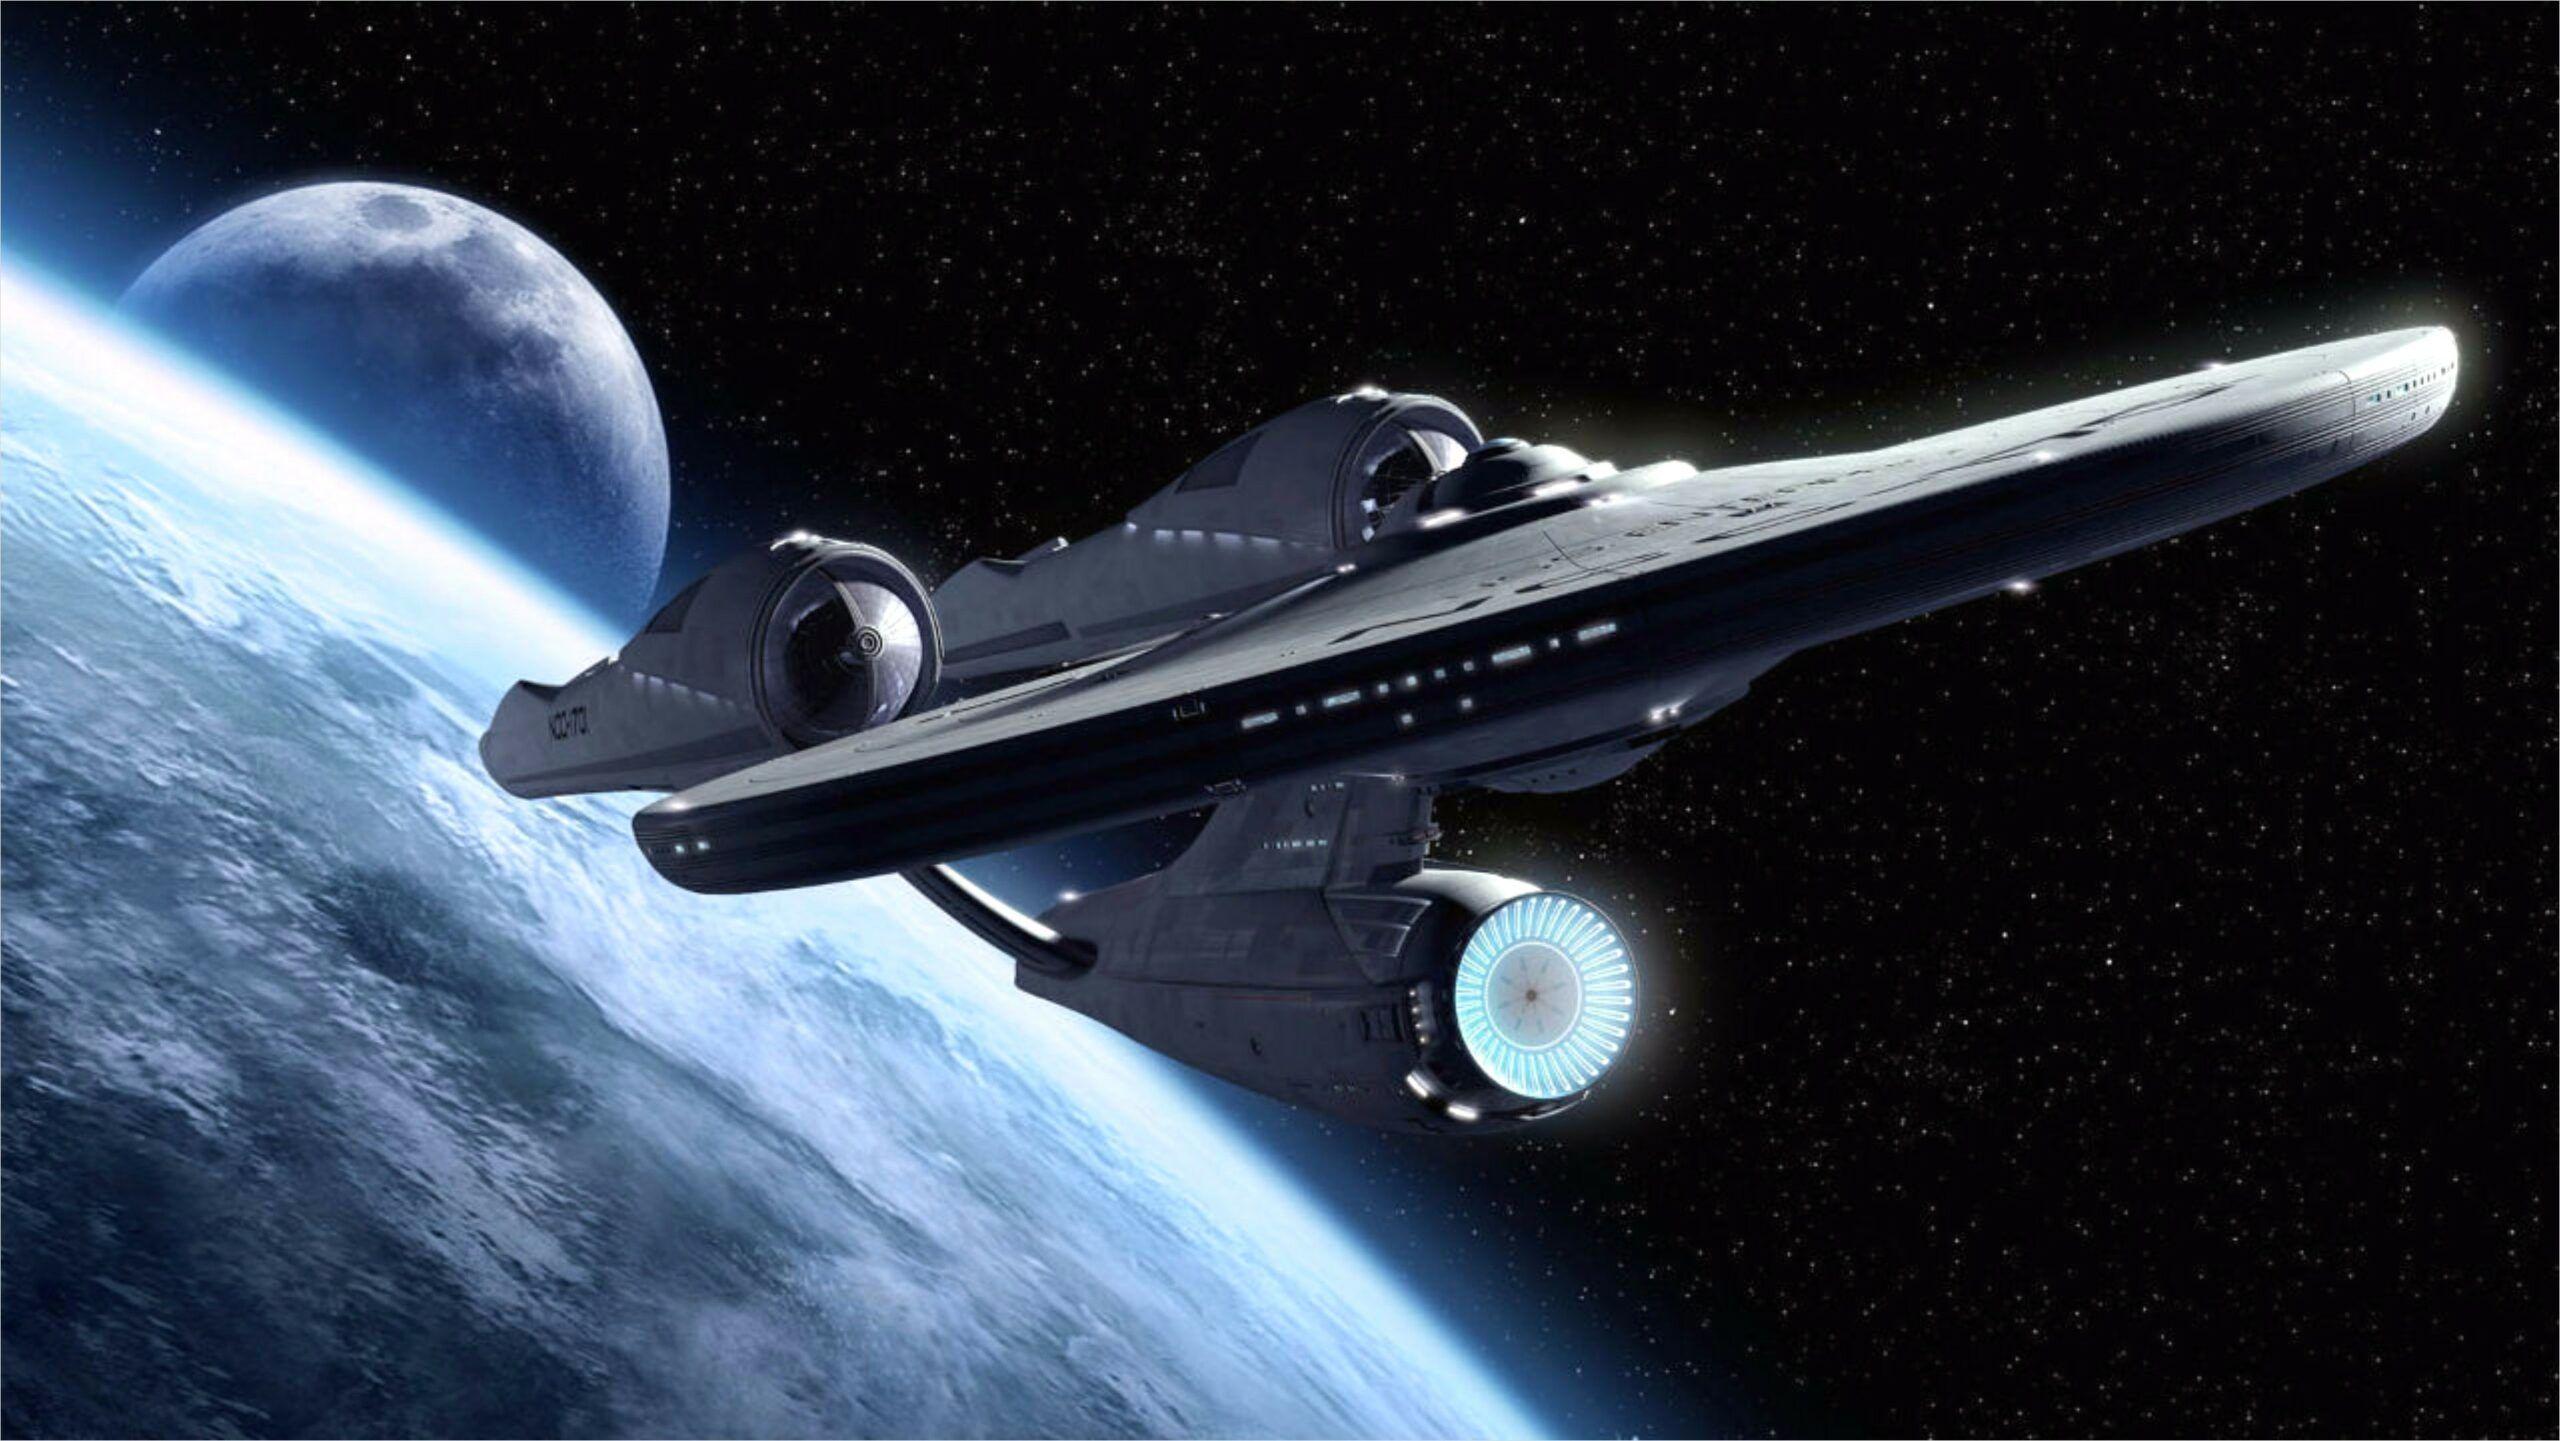 Star Trek Wallpaper 4k In 2020 Star Trek Wallpaper Star Trek Star Trek Movies